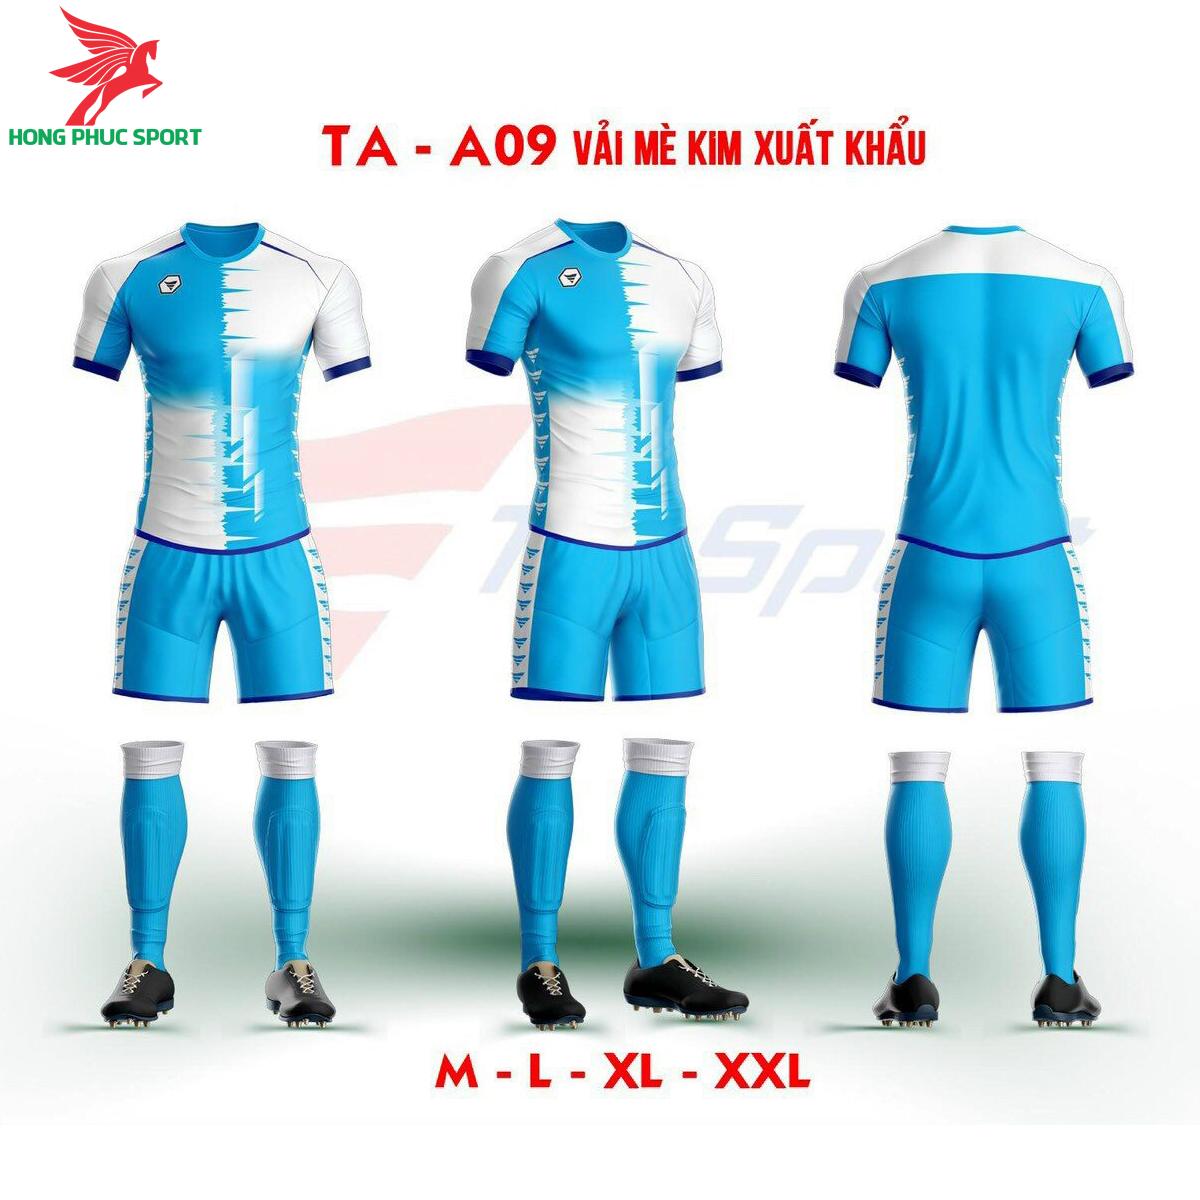 https://cdn.hongphucsport.com/unsafe/s4.shopbay.vn/files/285/ao-khong-logo-truong-an-ta-a09-mau-xanh-da-troi-trang-1-603e01e5c904d.png